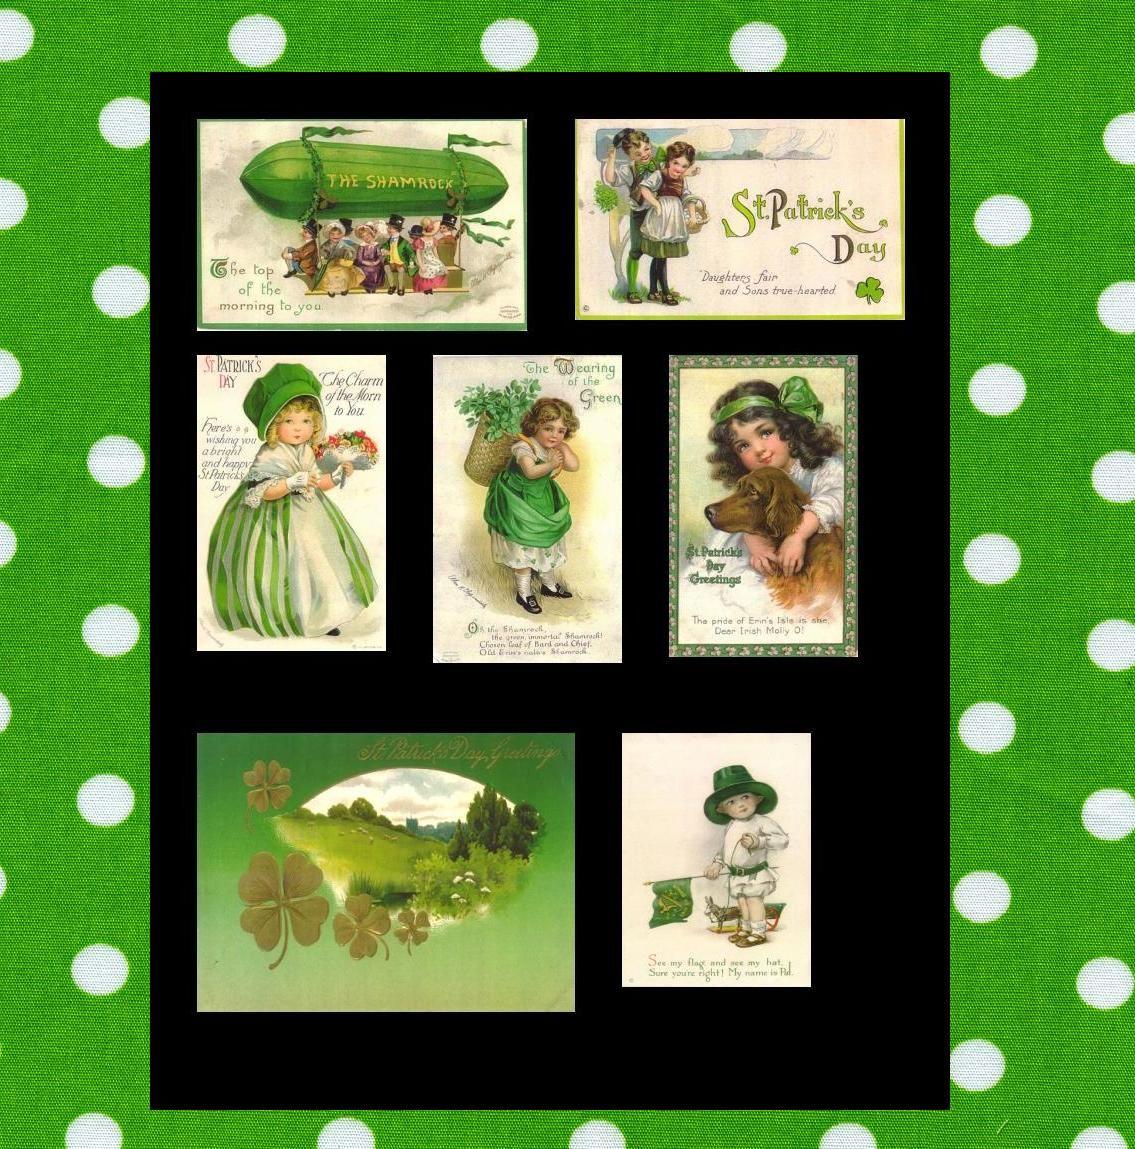 Free Printable Collage Sheets | Free Printable Spring Green Collage - Free Printable Picture Collage